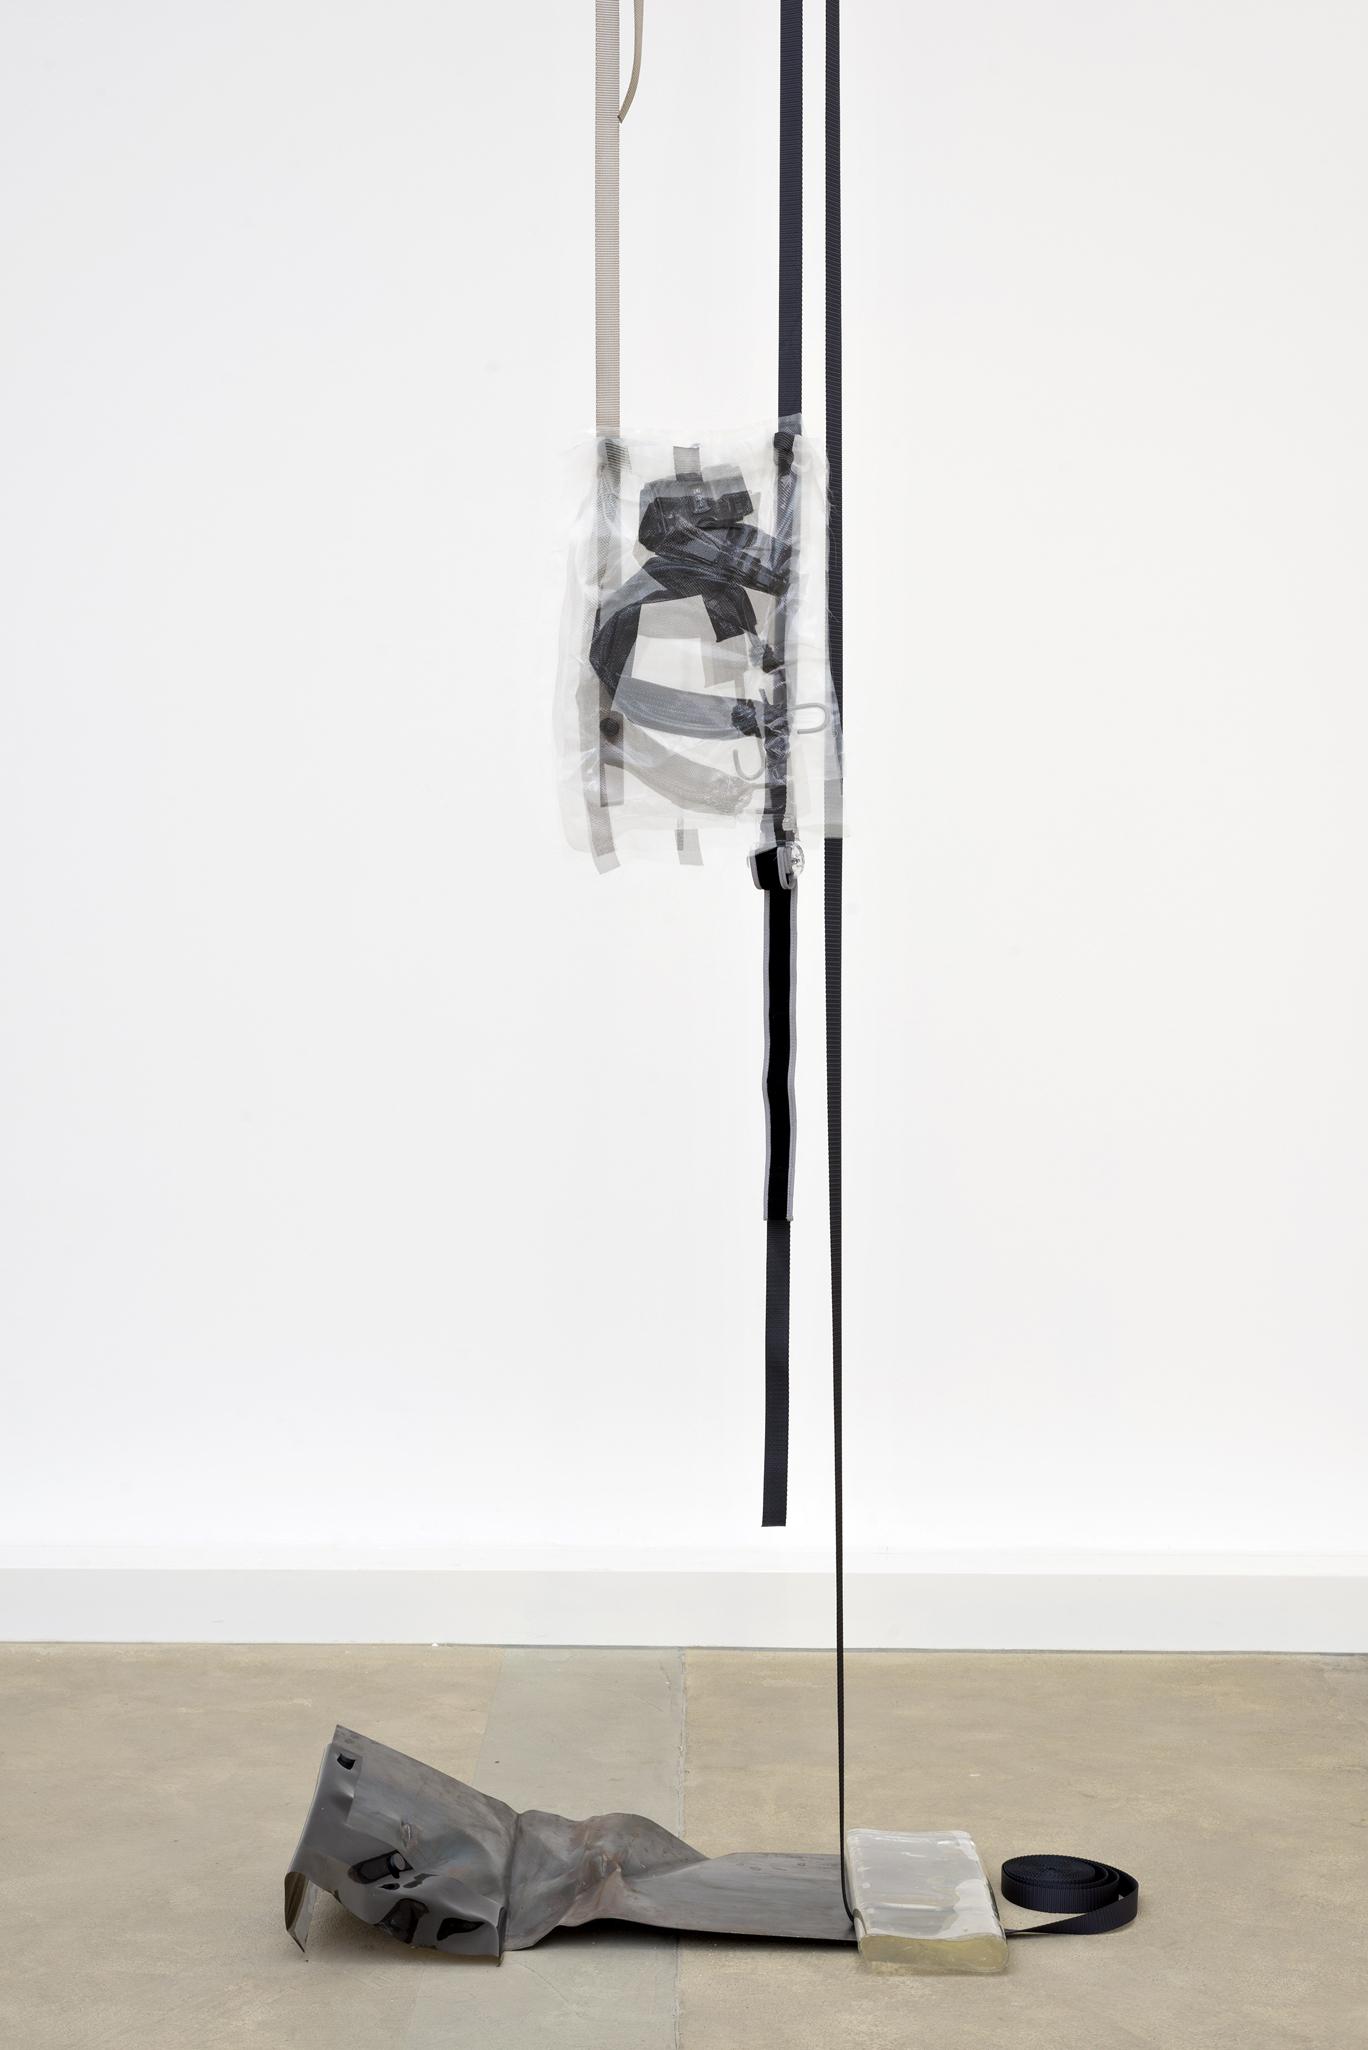 Intereliance Suspensions, 2014